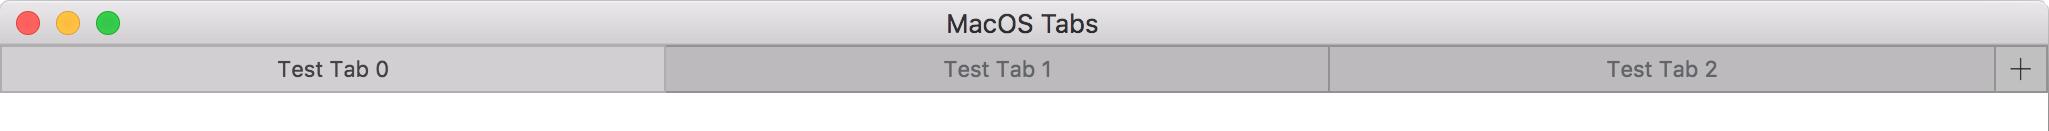 MacOS Tabs